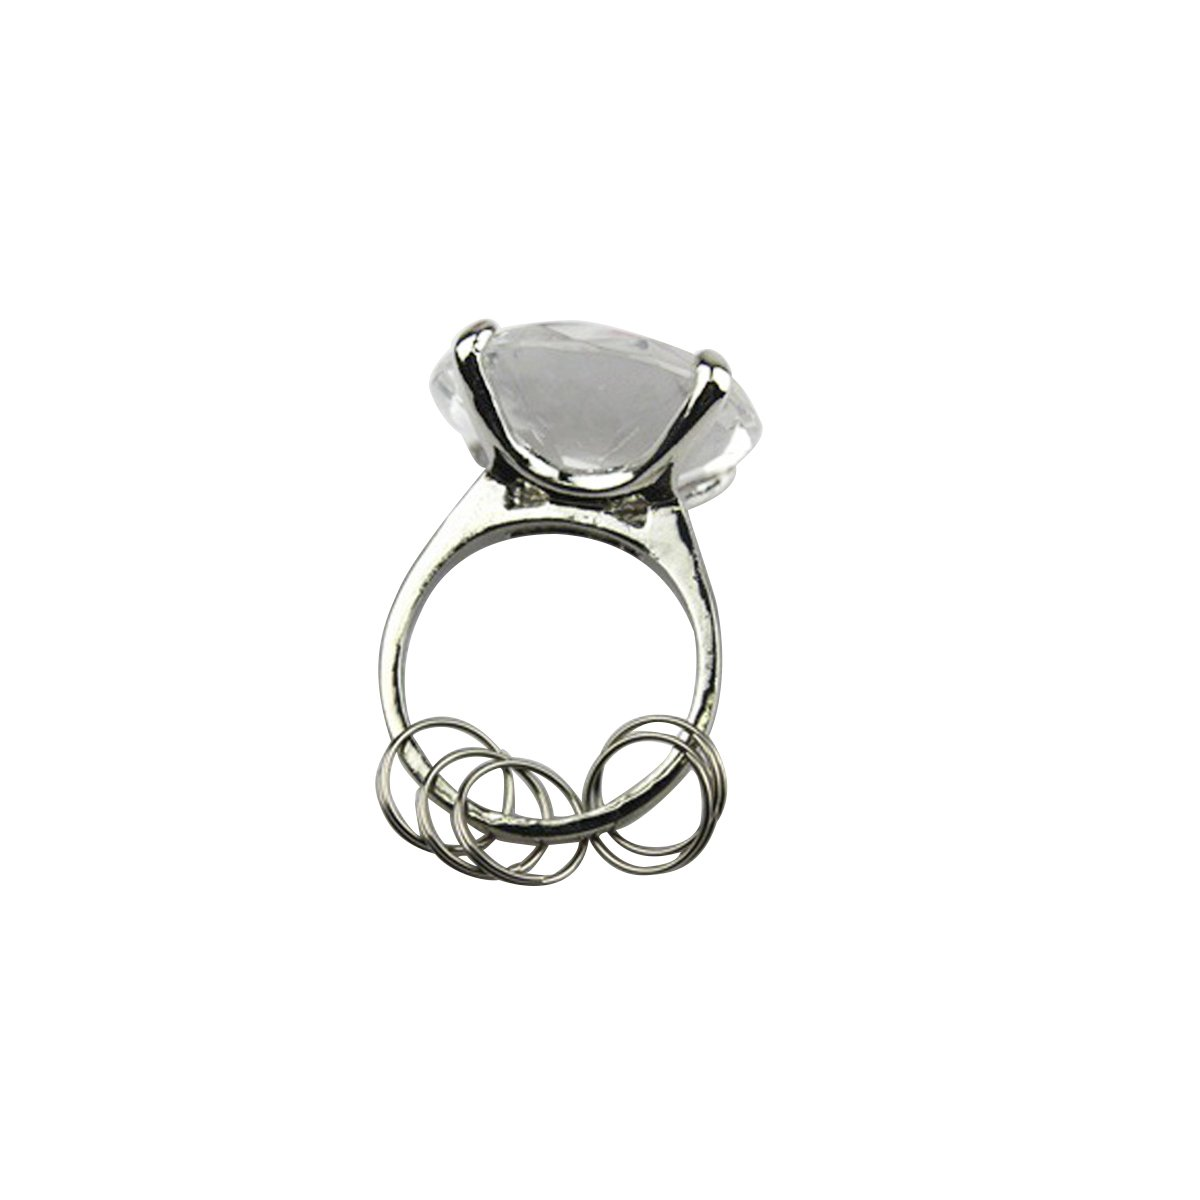 Amazon Bestoyard Big Diamond Ring Keychain Keyring Holders Wedding Gift Bridal Shower Party Favor Toys Games: Cat Maid Wedding Ring At Websimilar.org